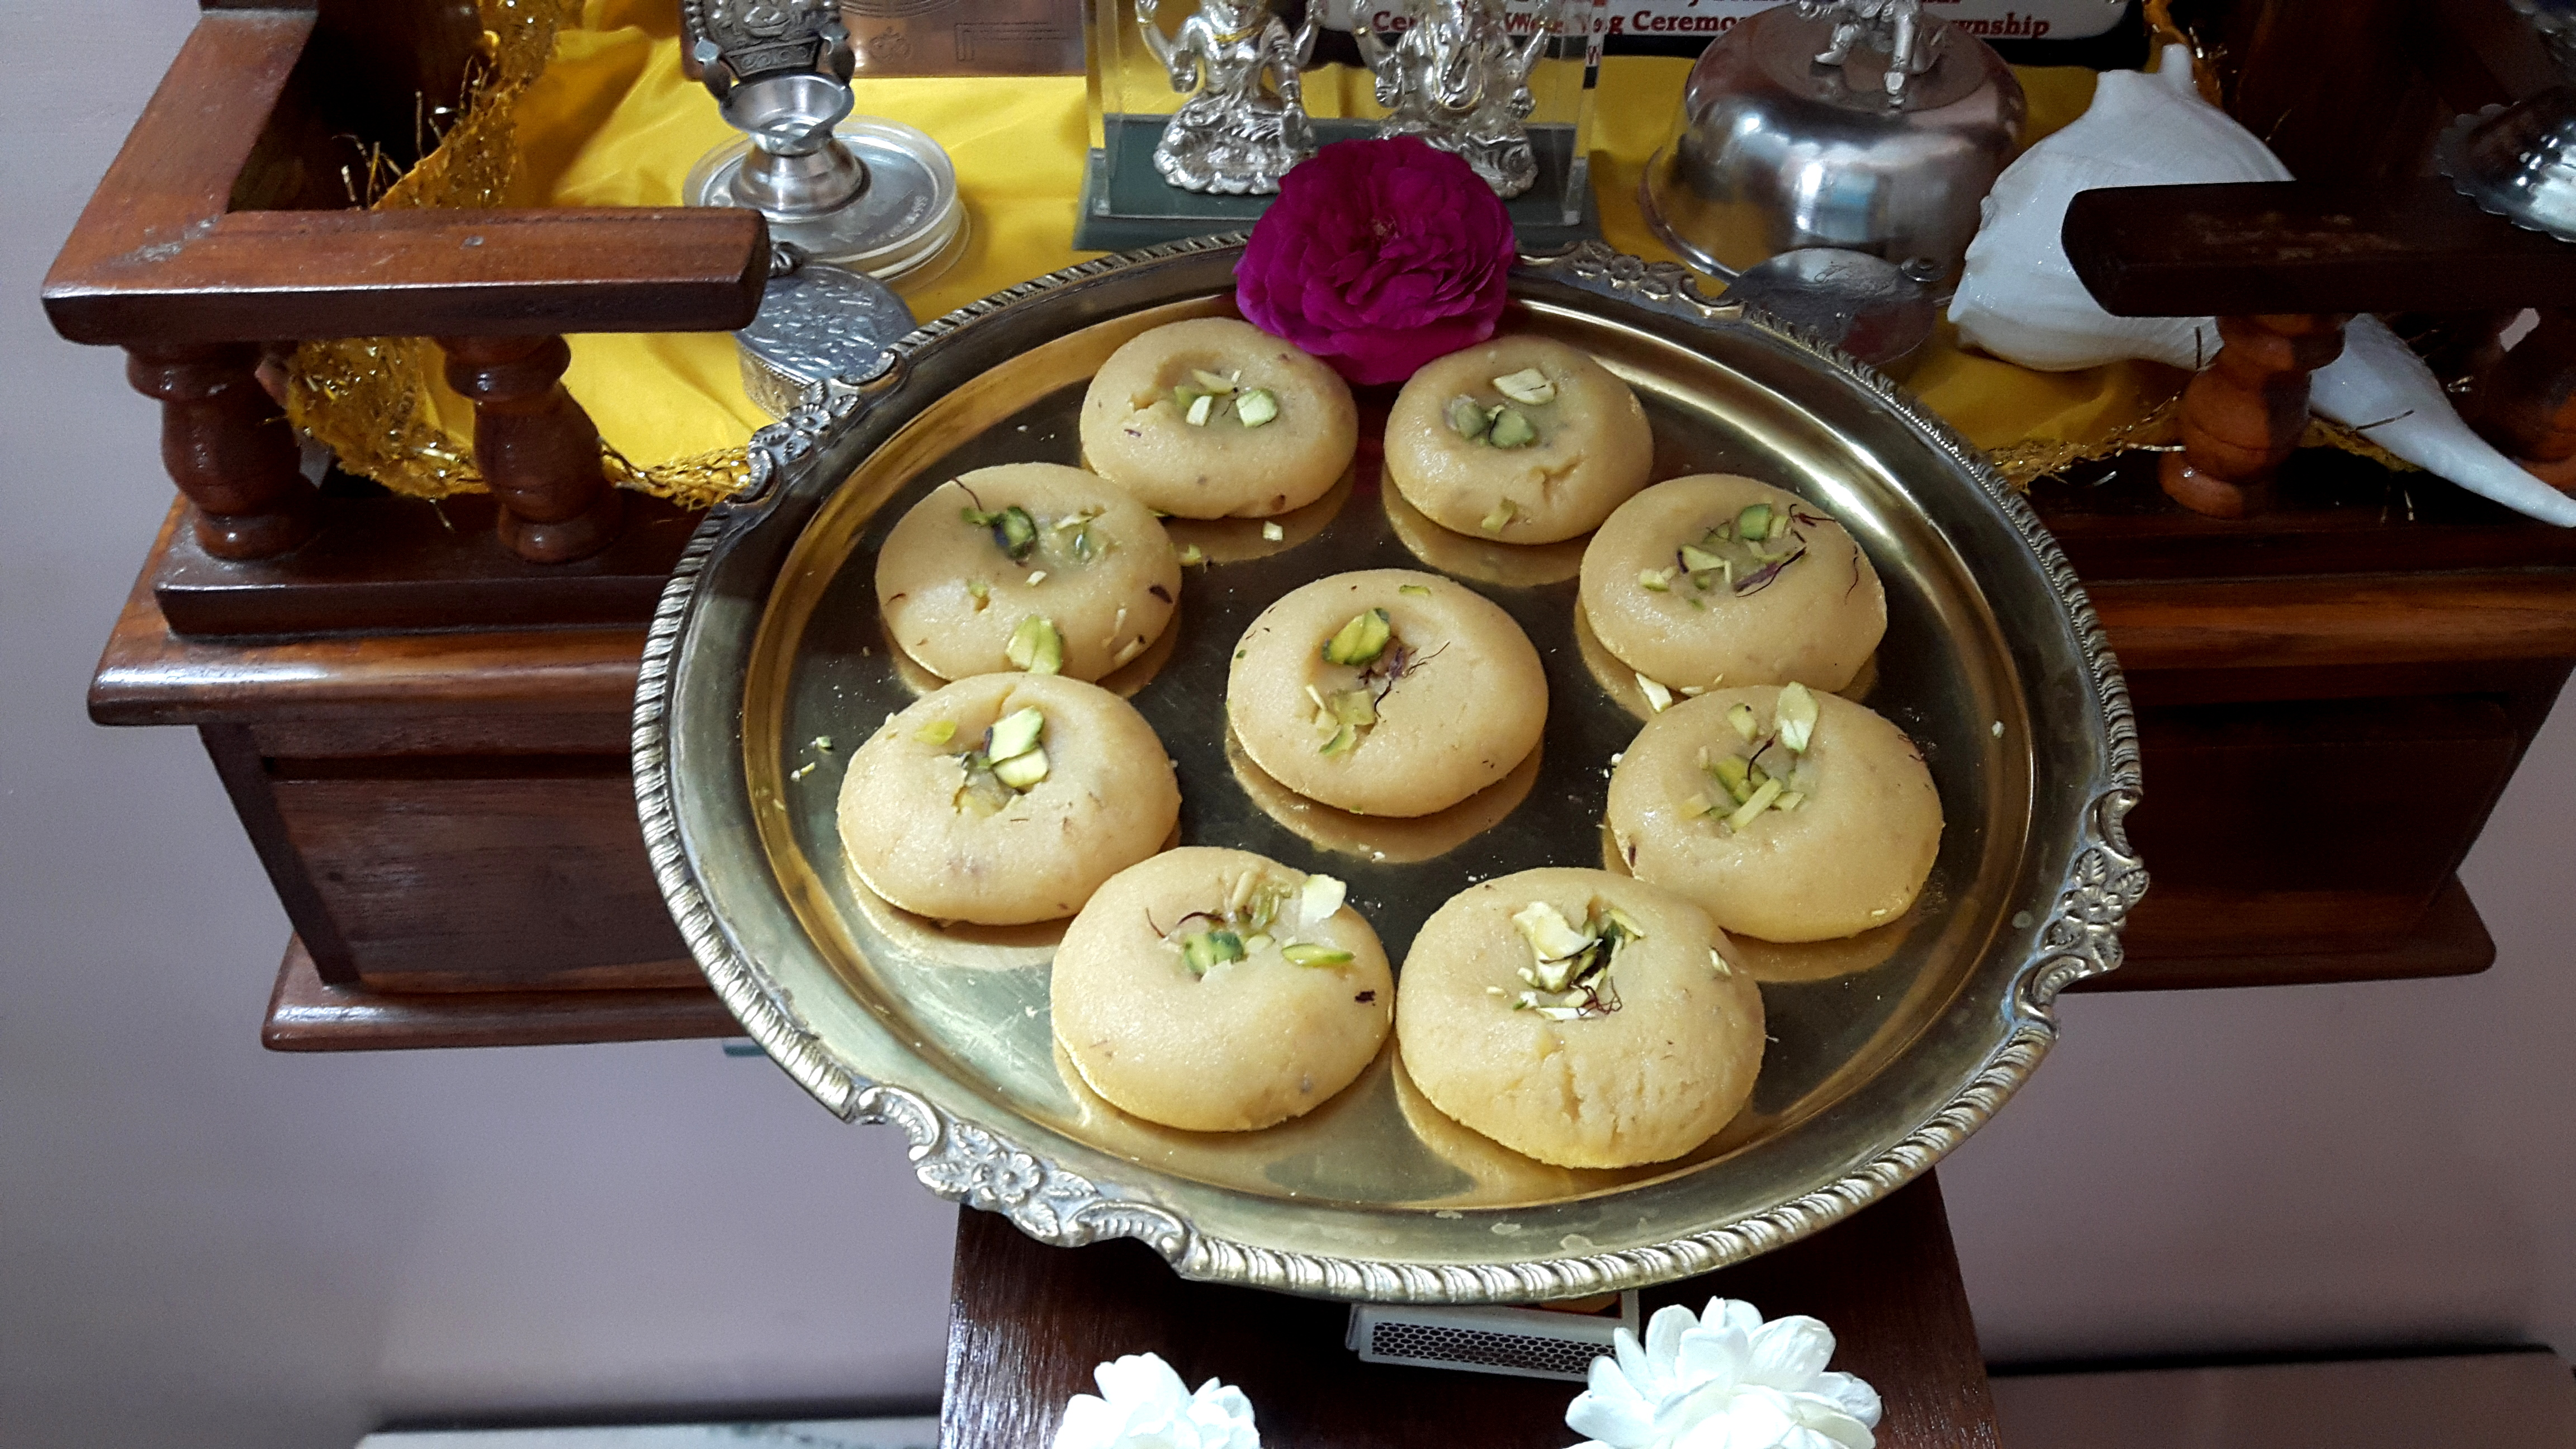 Kesar elaichi peda (saffron cardamom sweets/peda)